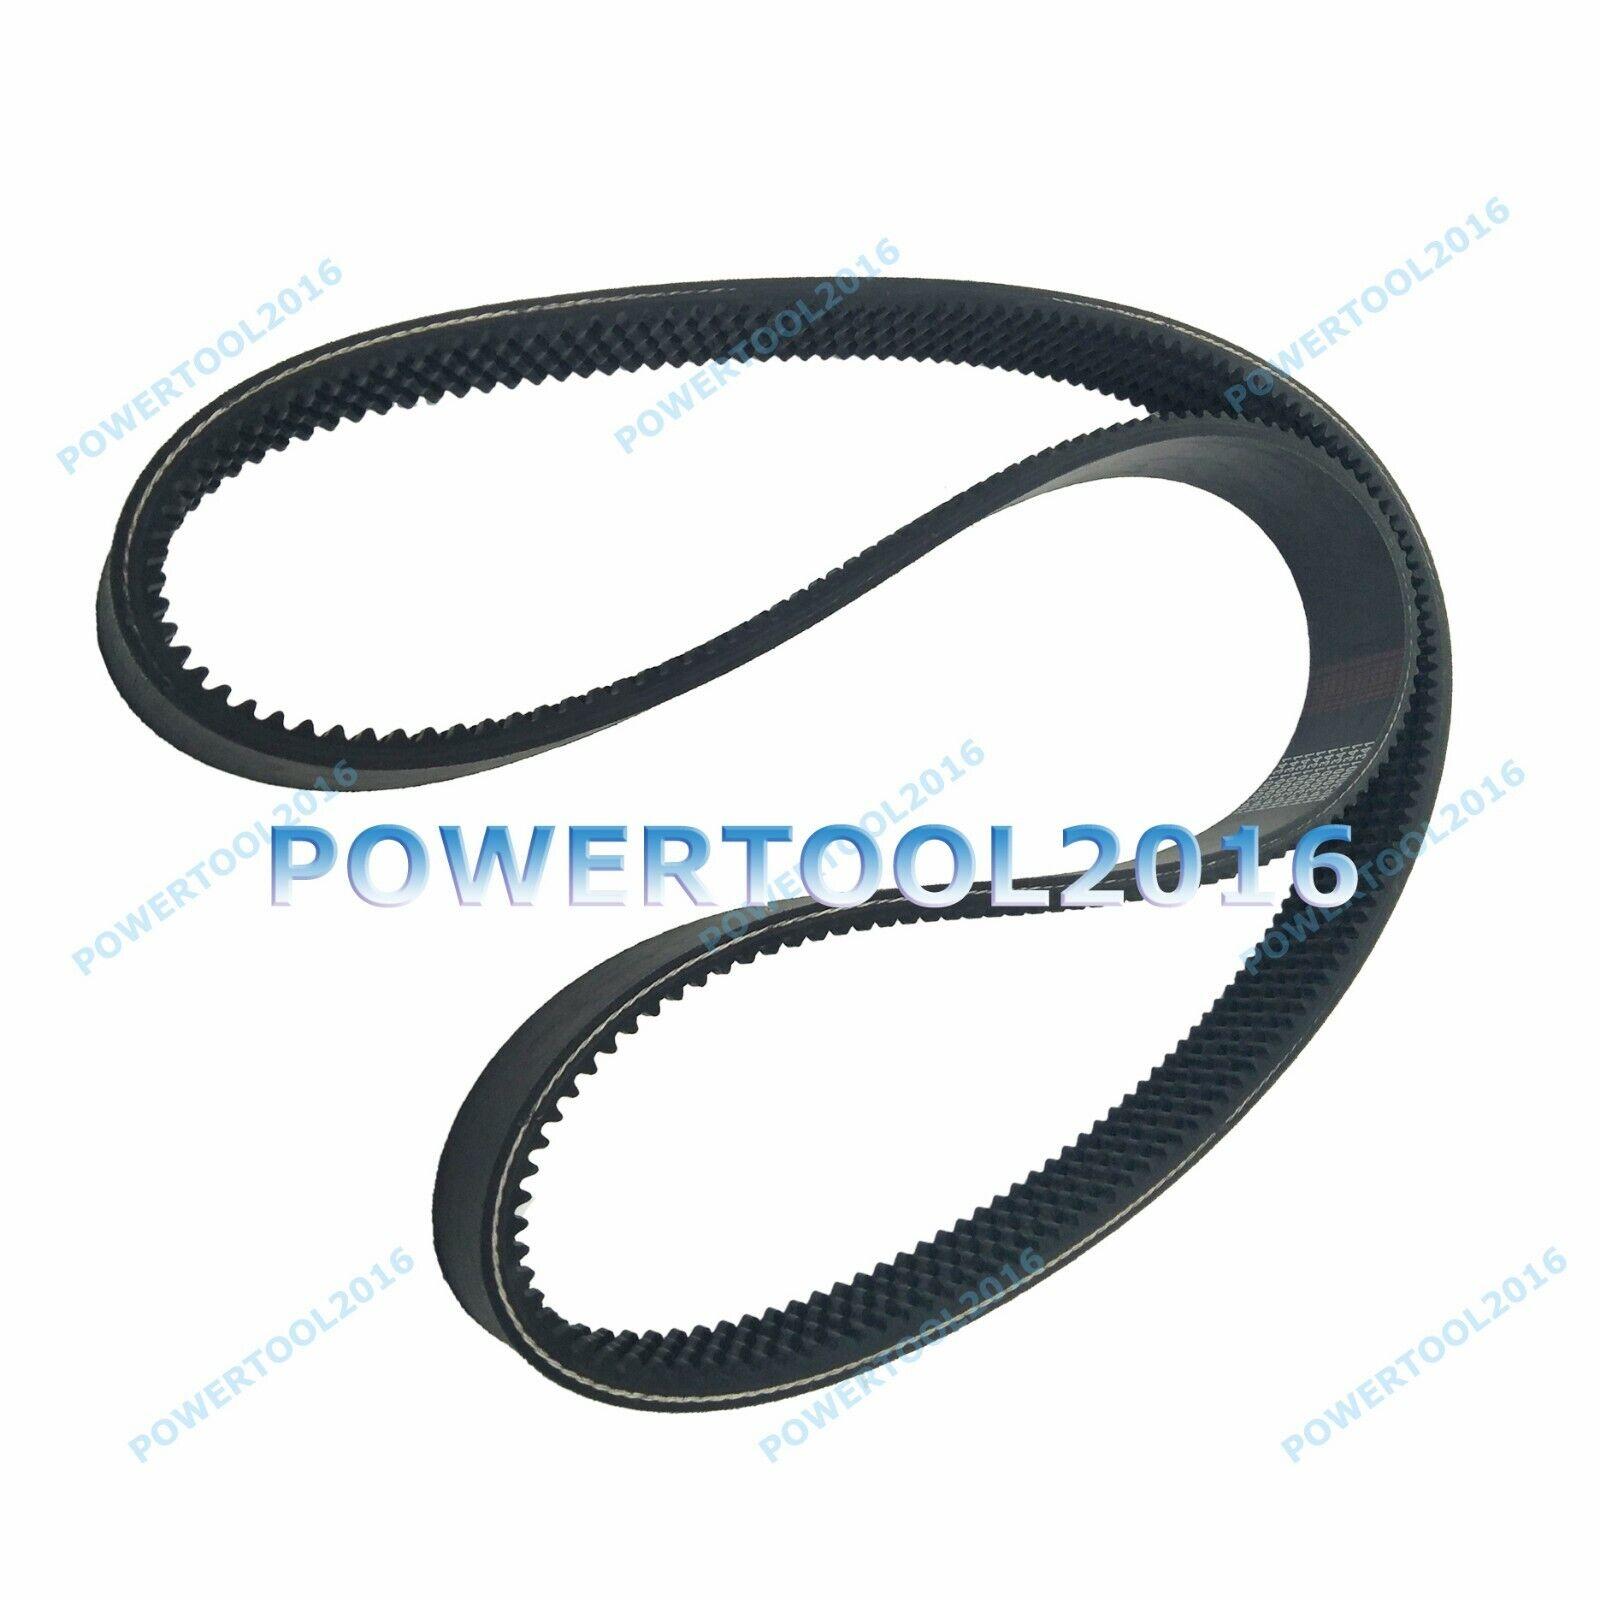 Replacement Parts Alternator Belt 7100104 for Bobcat S130 S150 ...